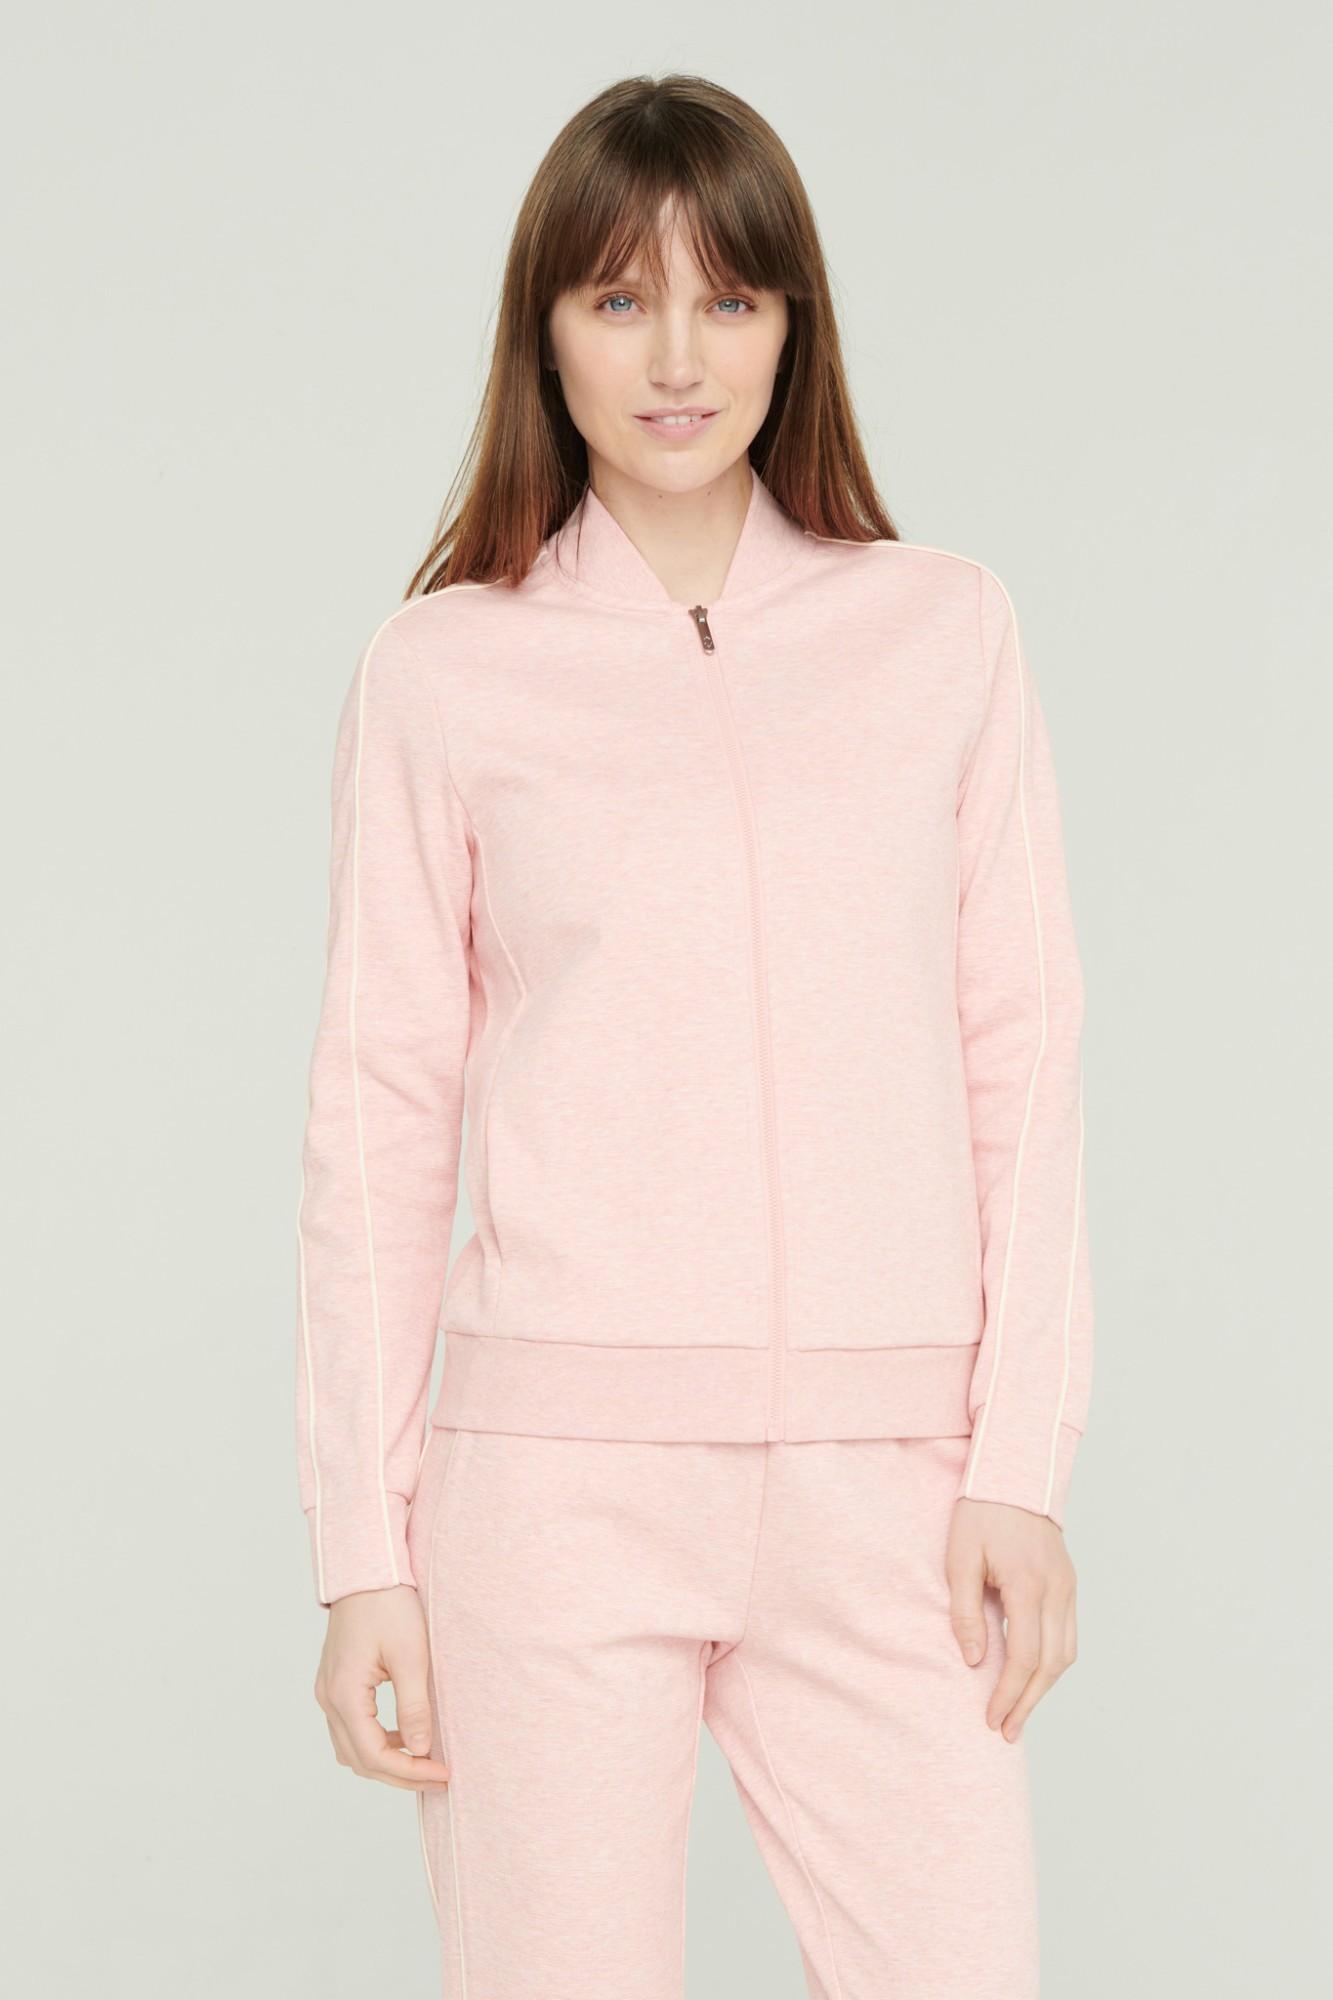 AUDIMAS Atsegamas medvilninis džemperis 2111-054 Chintz Rose Melange S